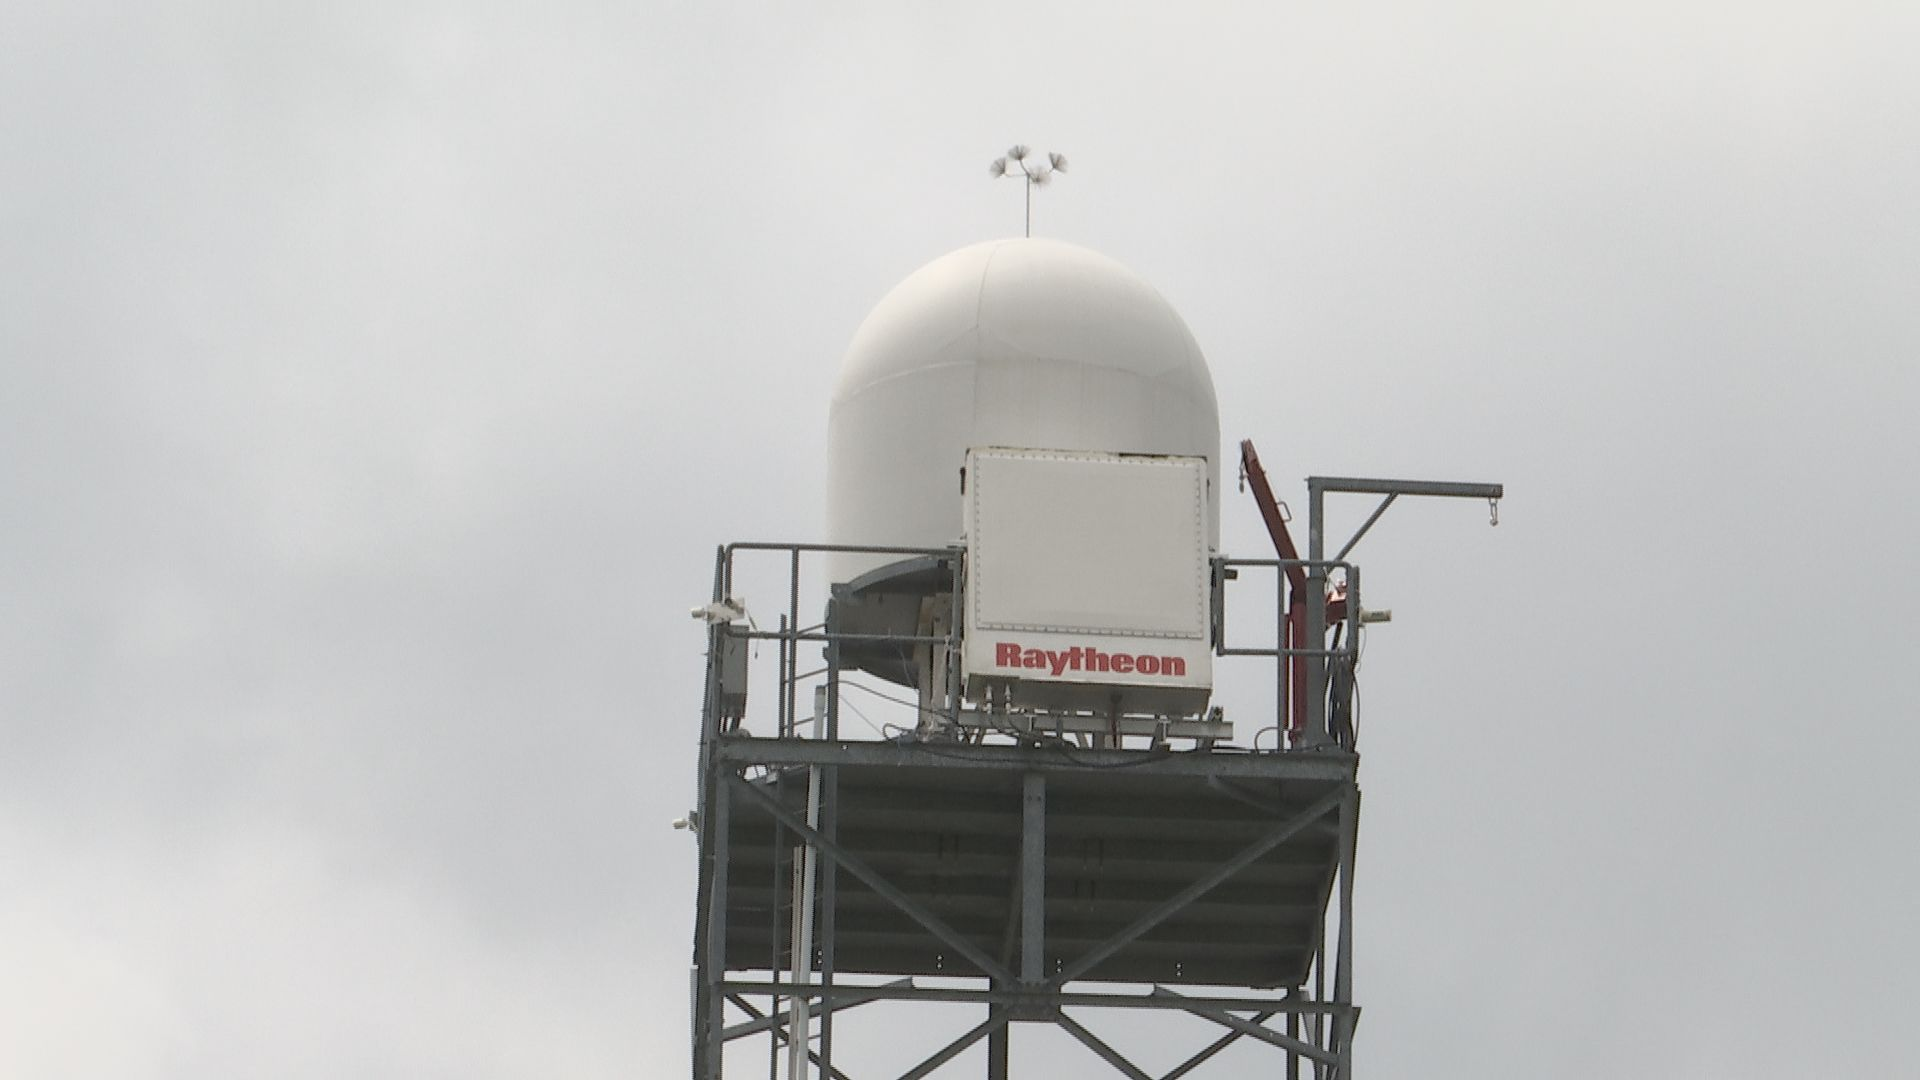 Nyc Weather Radar